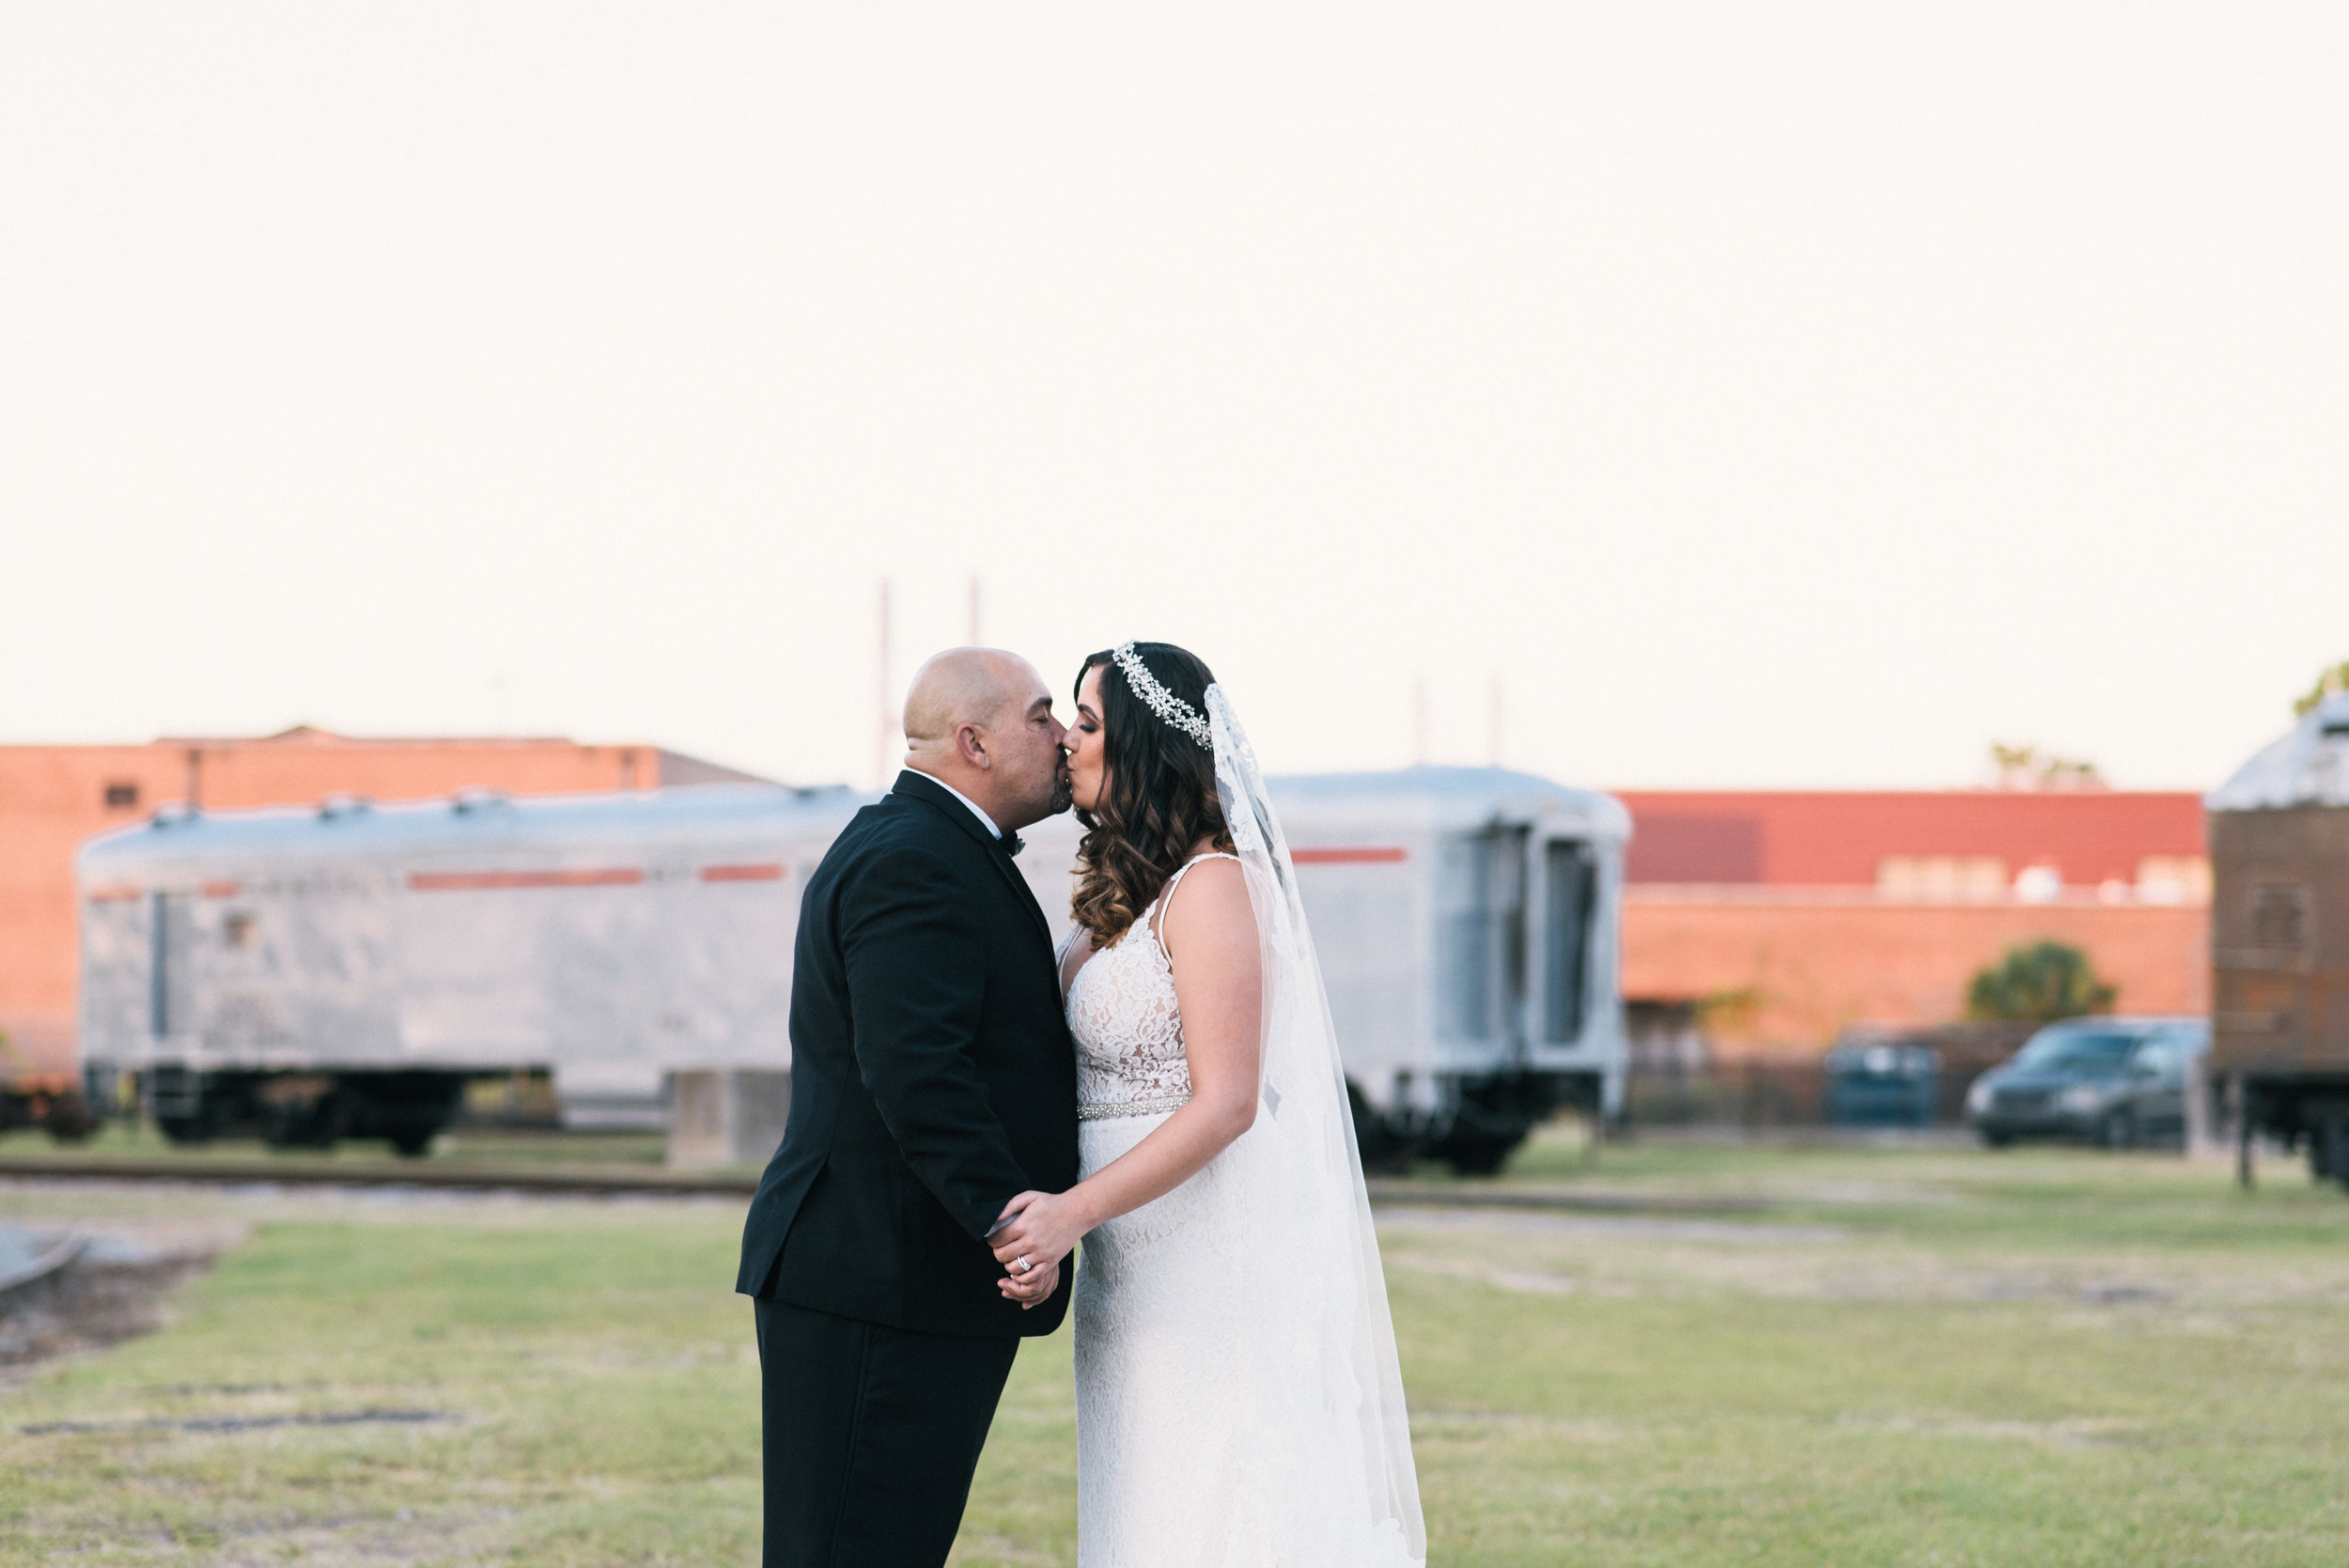 Iggy-and-yesenia-savannah-railroad-museum-wedding-meg-hill-photo- (721 of 1037).jpg